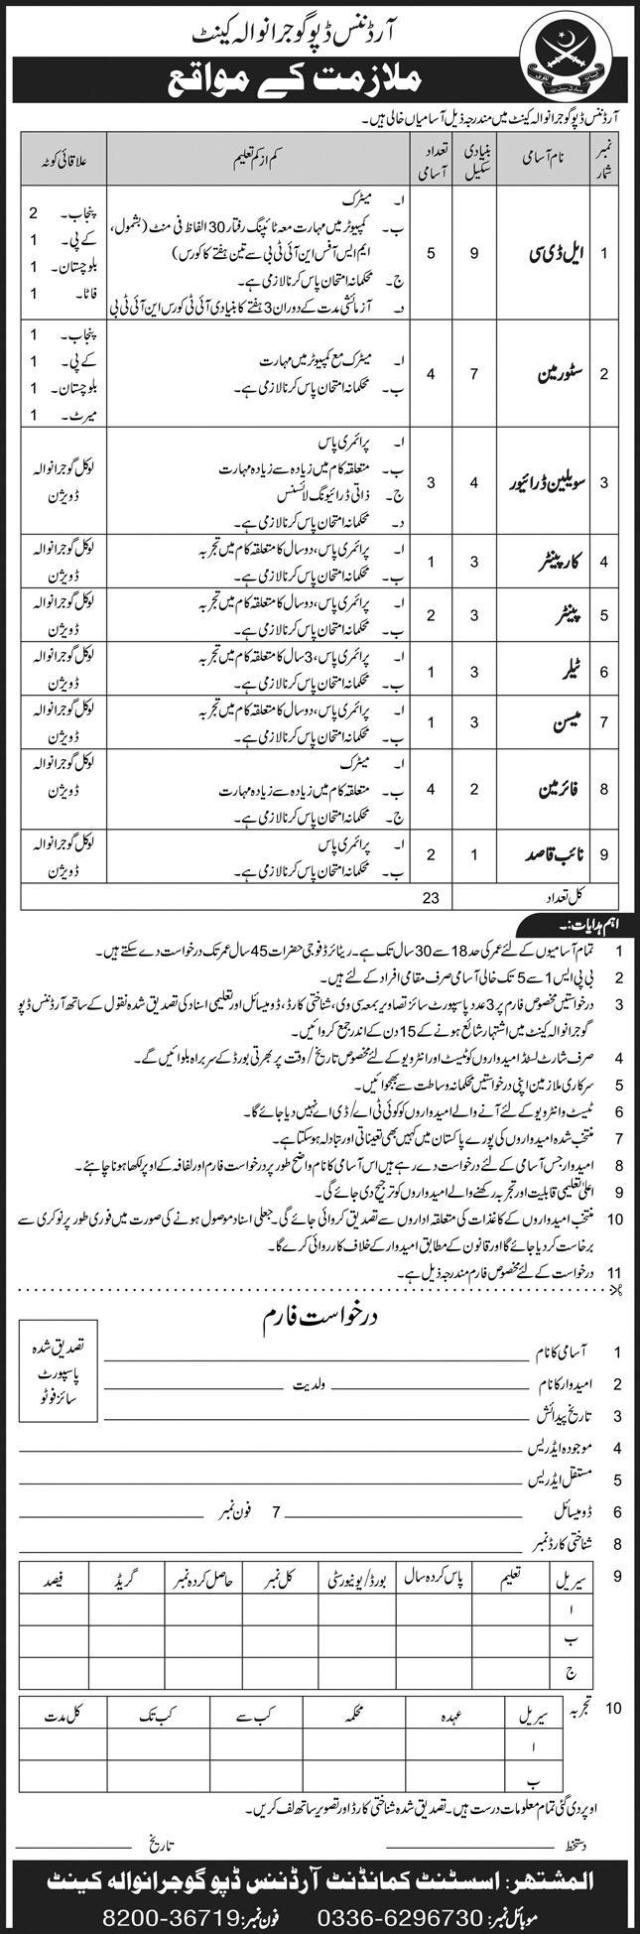 Ordinance depo Gujranwala cant Jobs